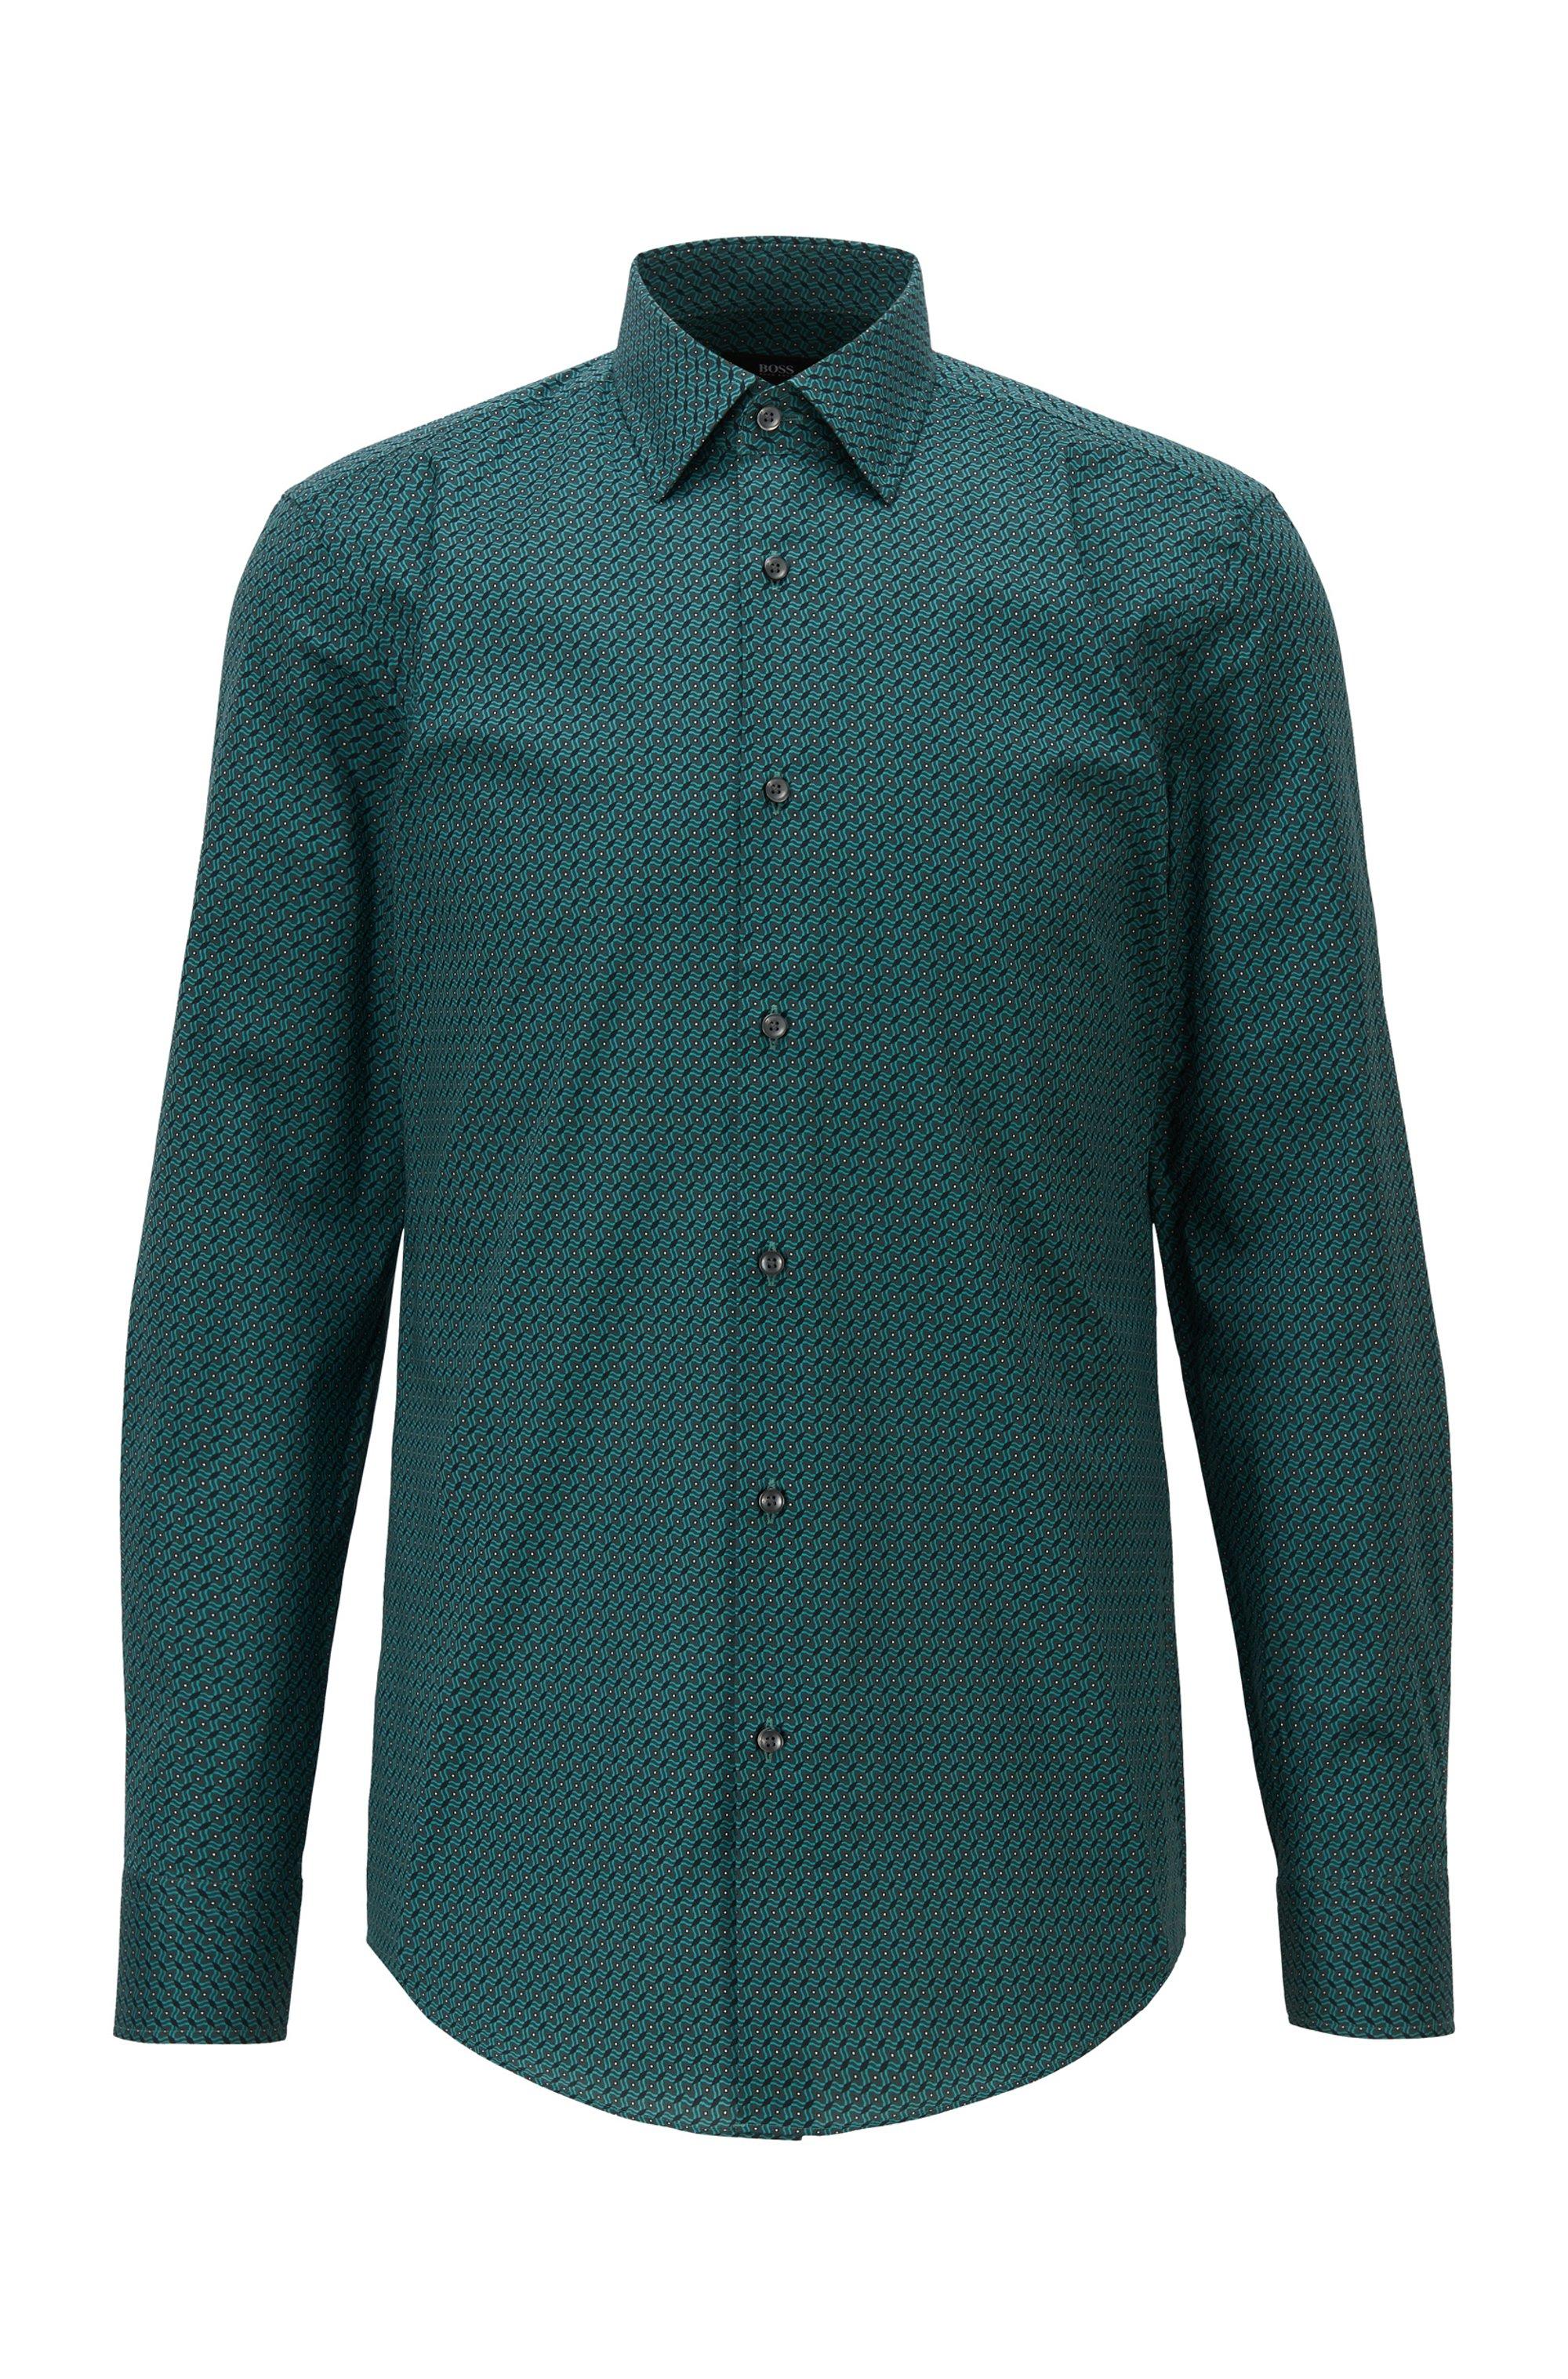 Slim-fit overhemd van Italiaanse stretchkatoen met print, Groen met dessin